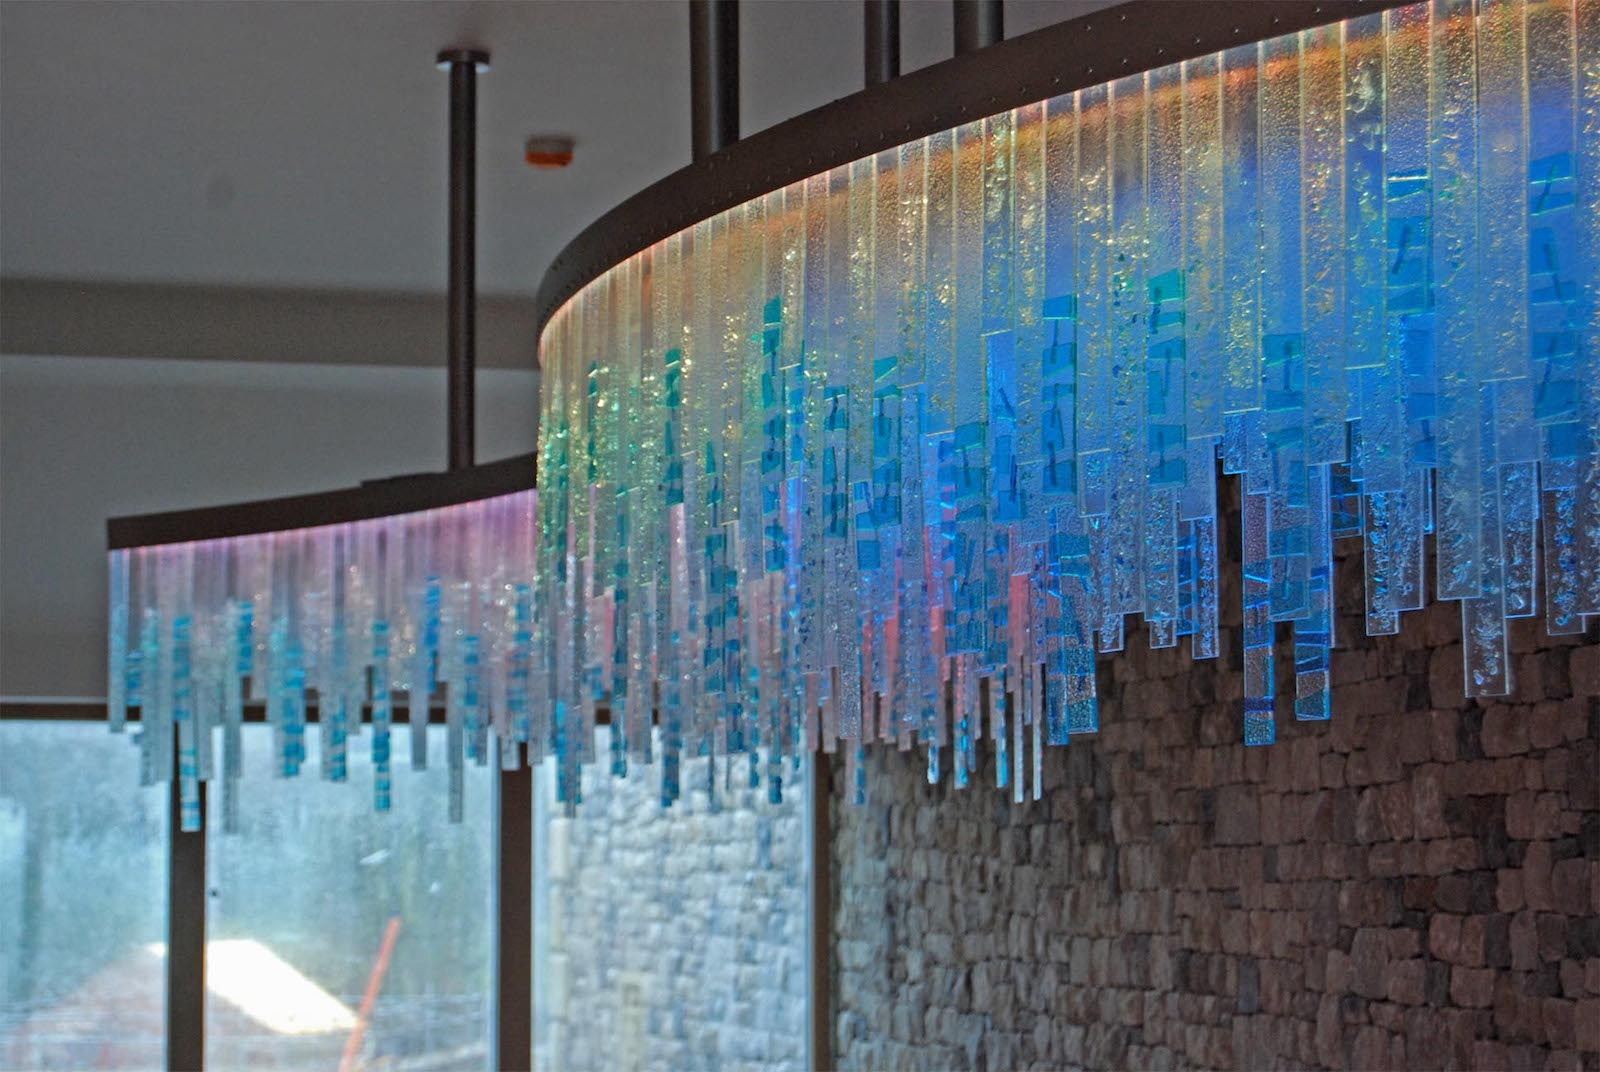 LED Lighting for Retail Displays